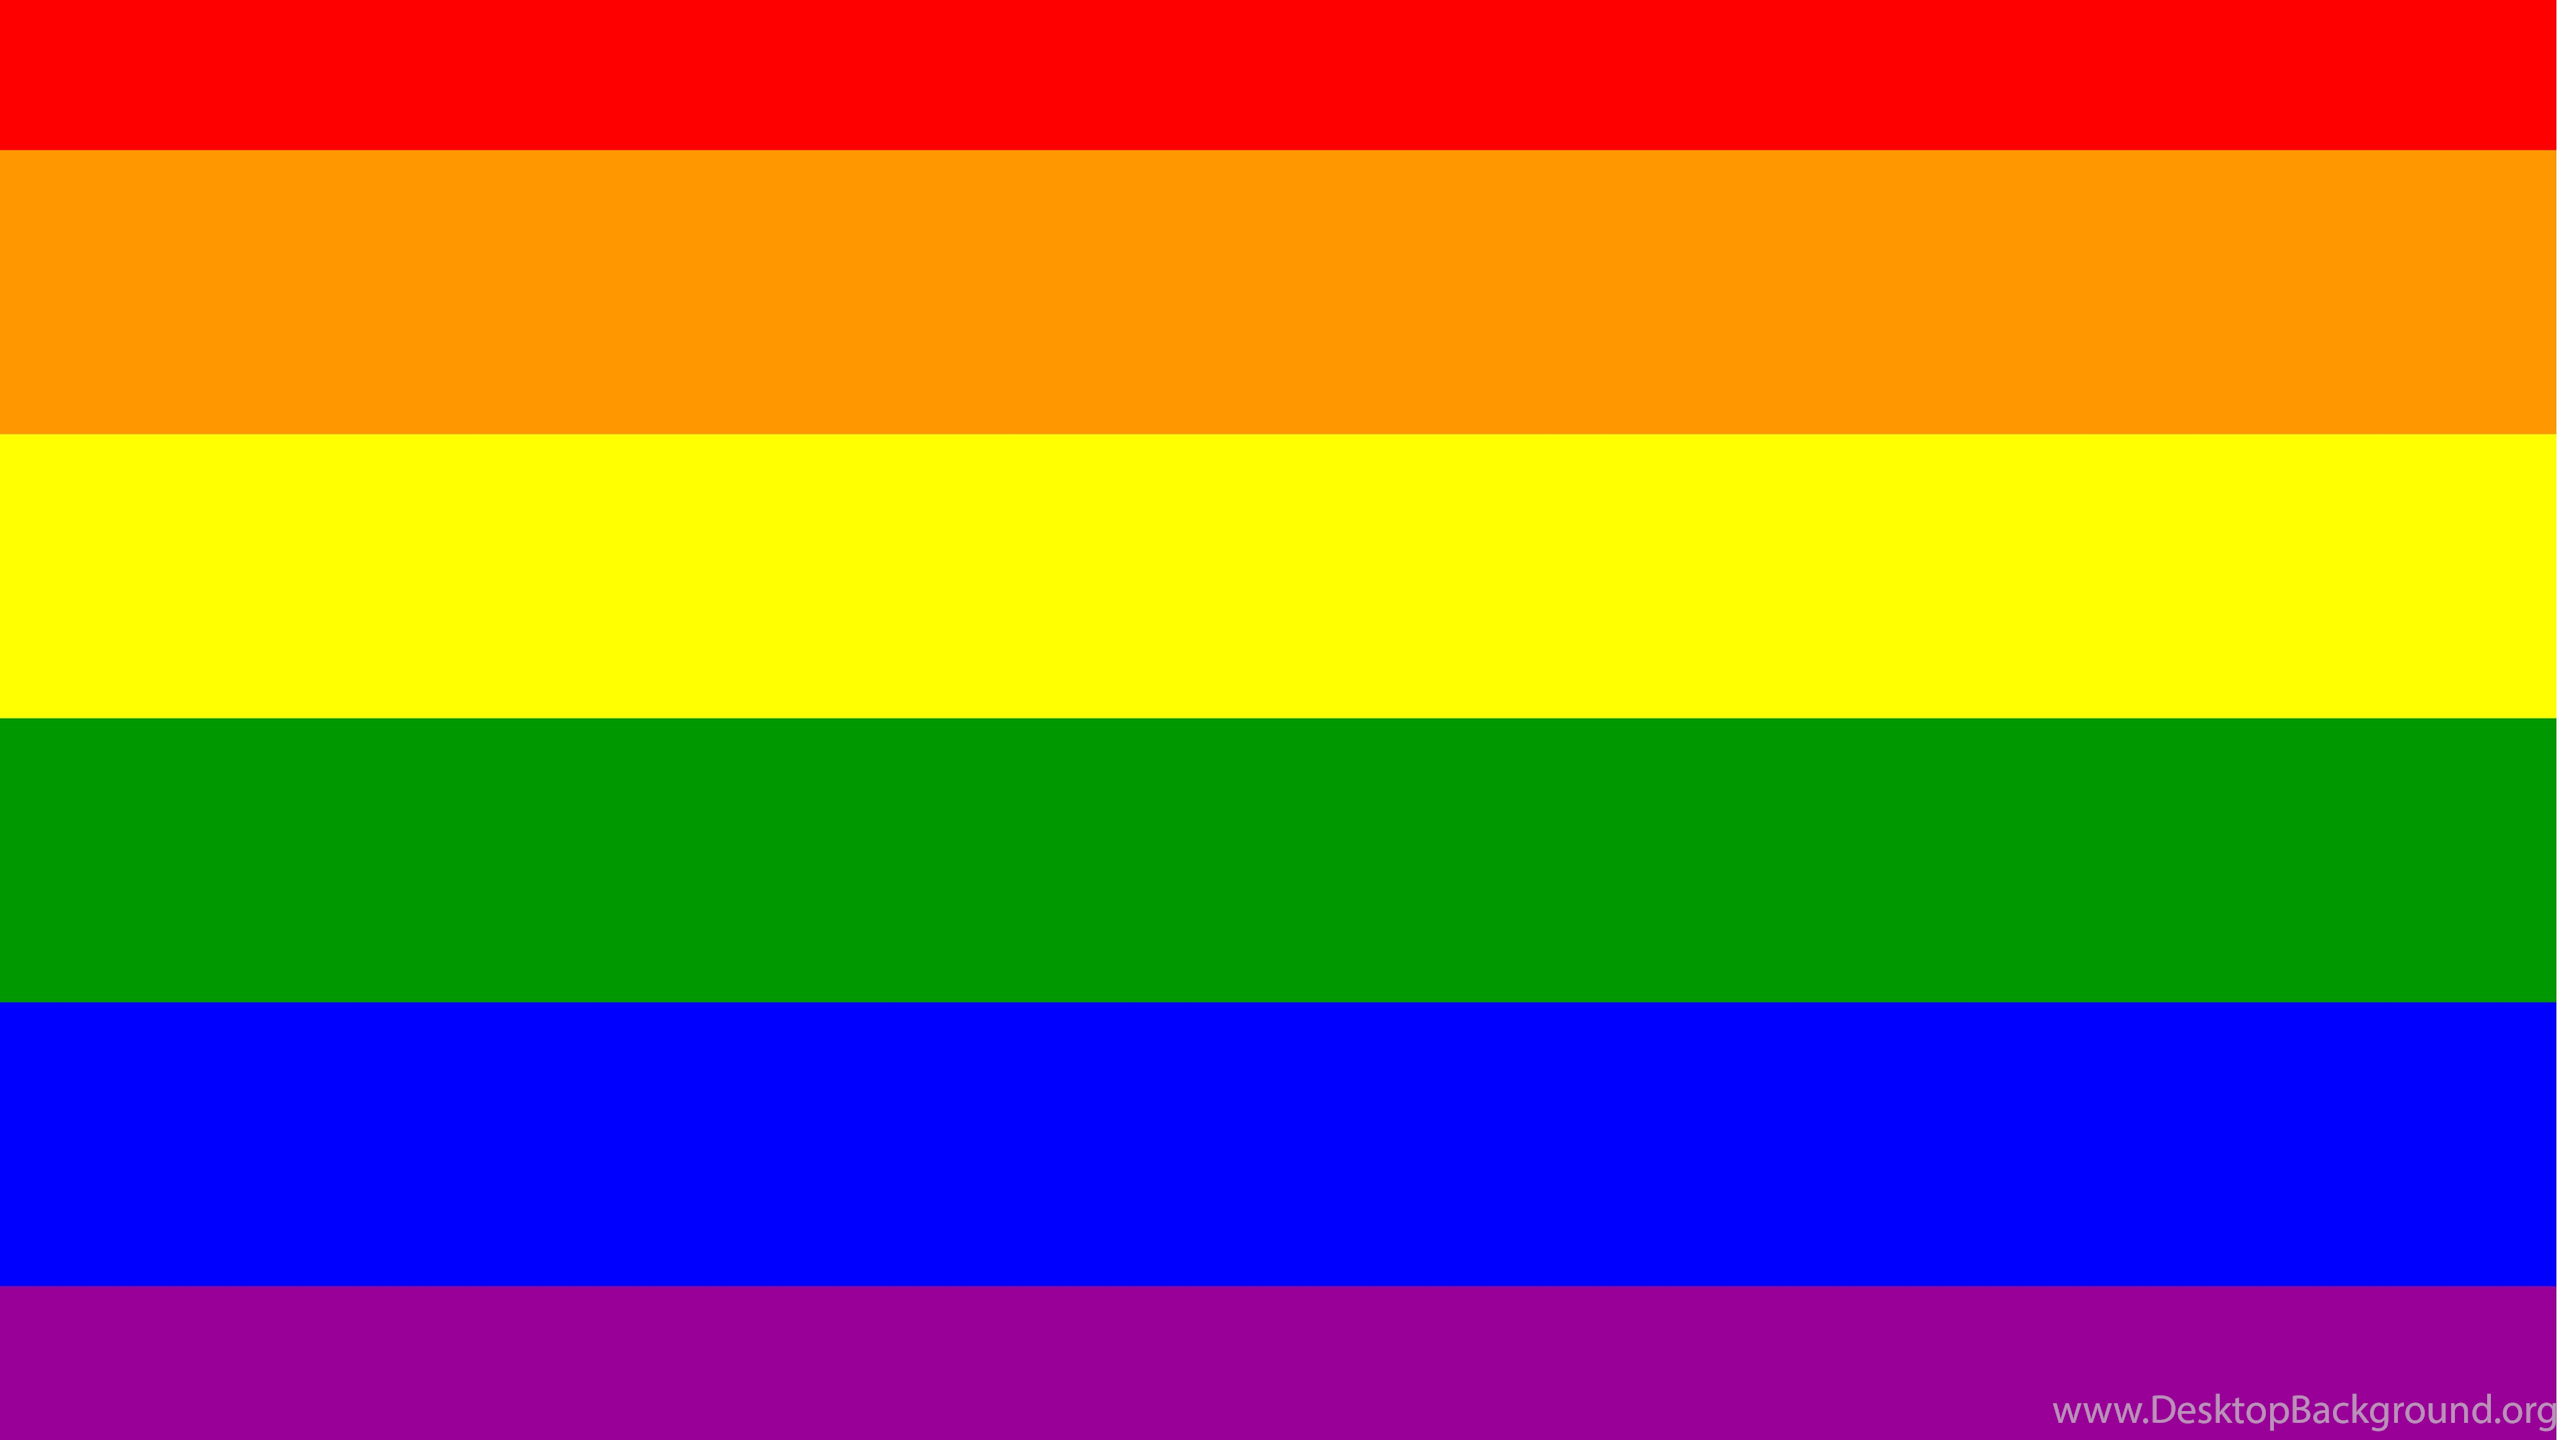 Gay Pride Wallpapers - Wallpaper Cave